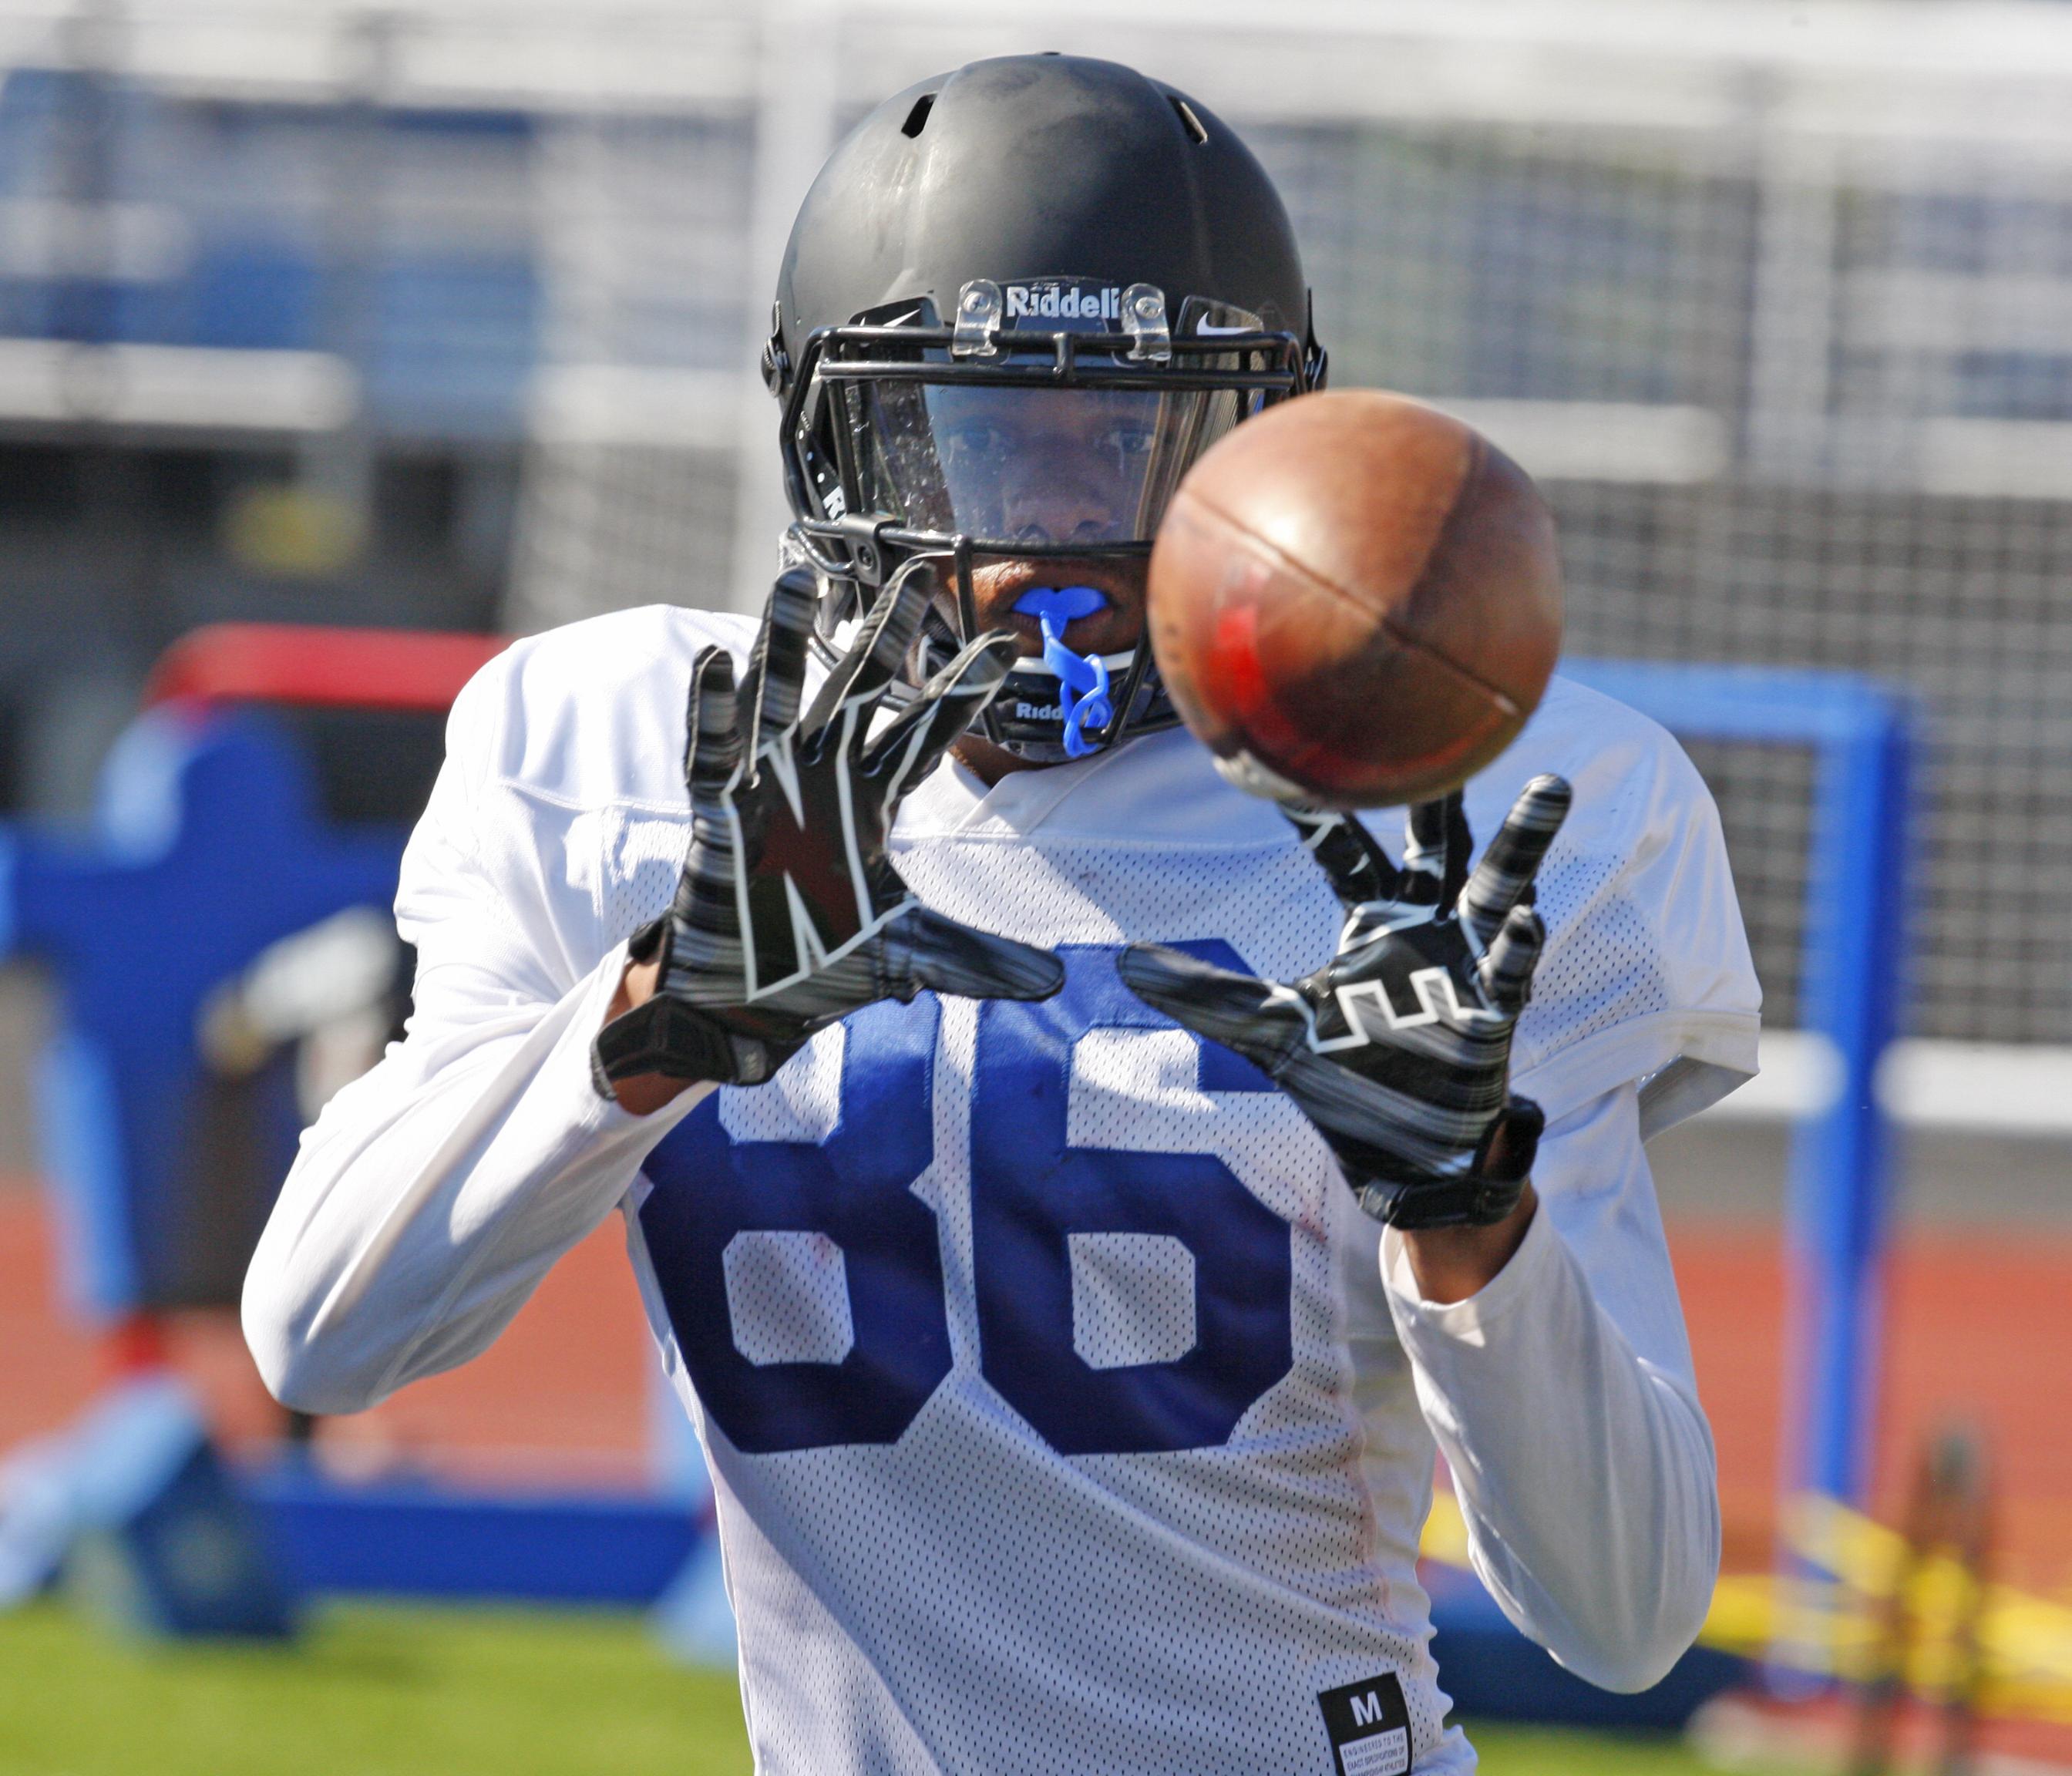 University at Buffalo football player Kamathi Holsey during practice on Tuesday, Aug. 9, 2016. (Harry Scull Jr./Buffalo News)